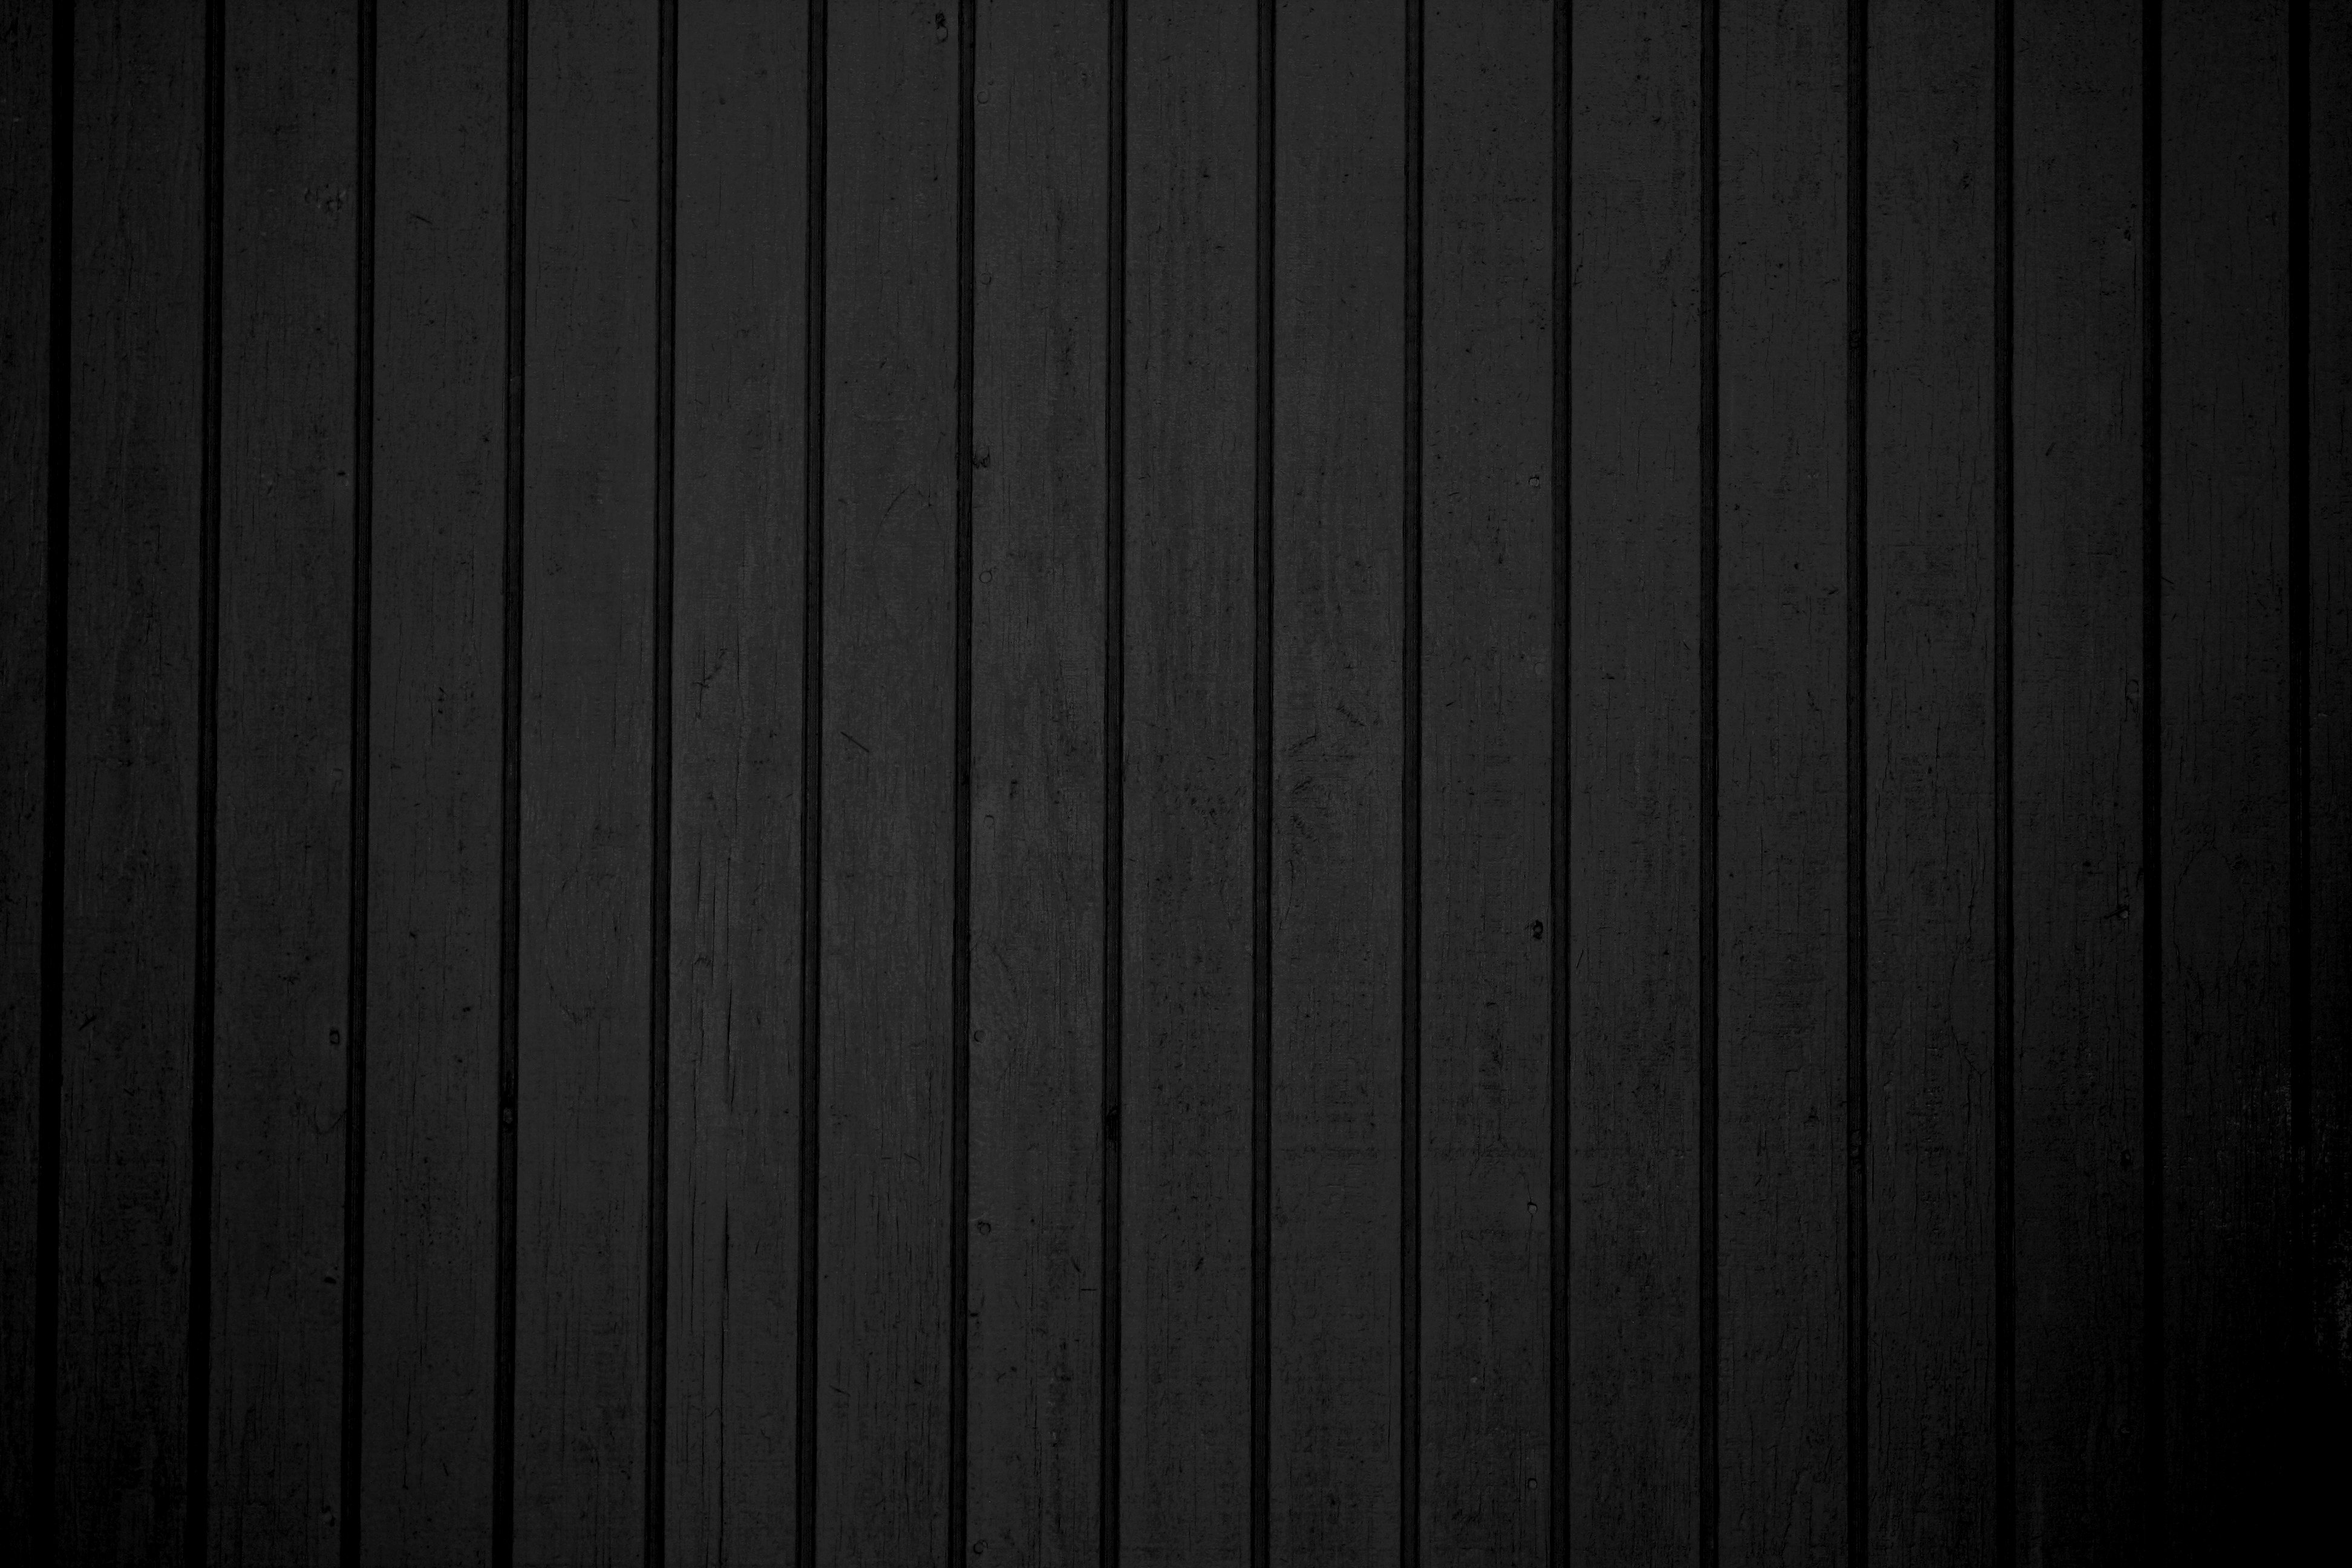 black textured wallpaper loopelecom floor texture. Black Floor Texture W   Ecohomeplus com